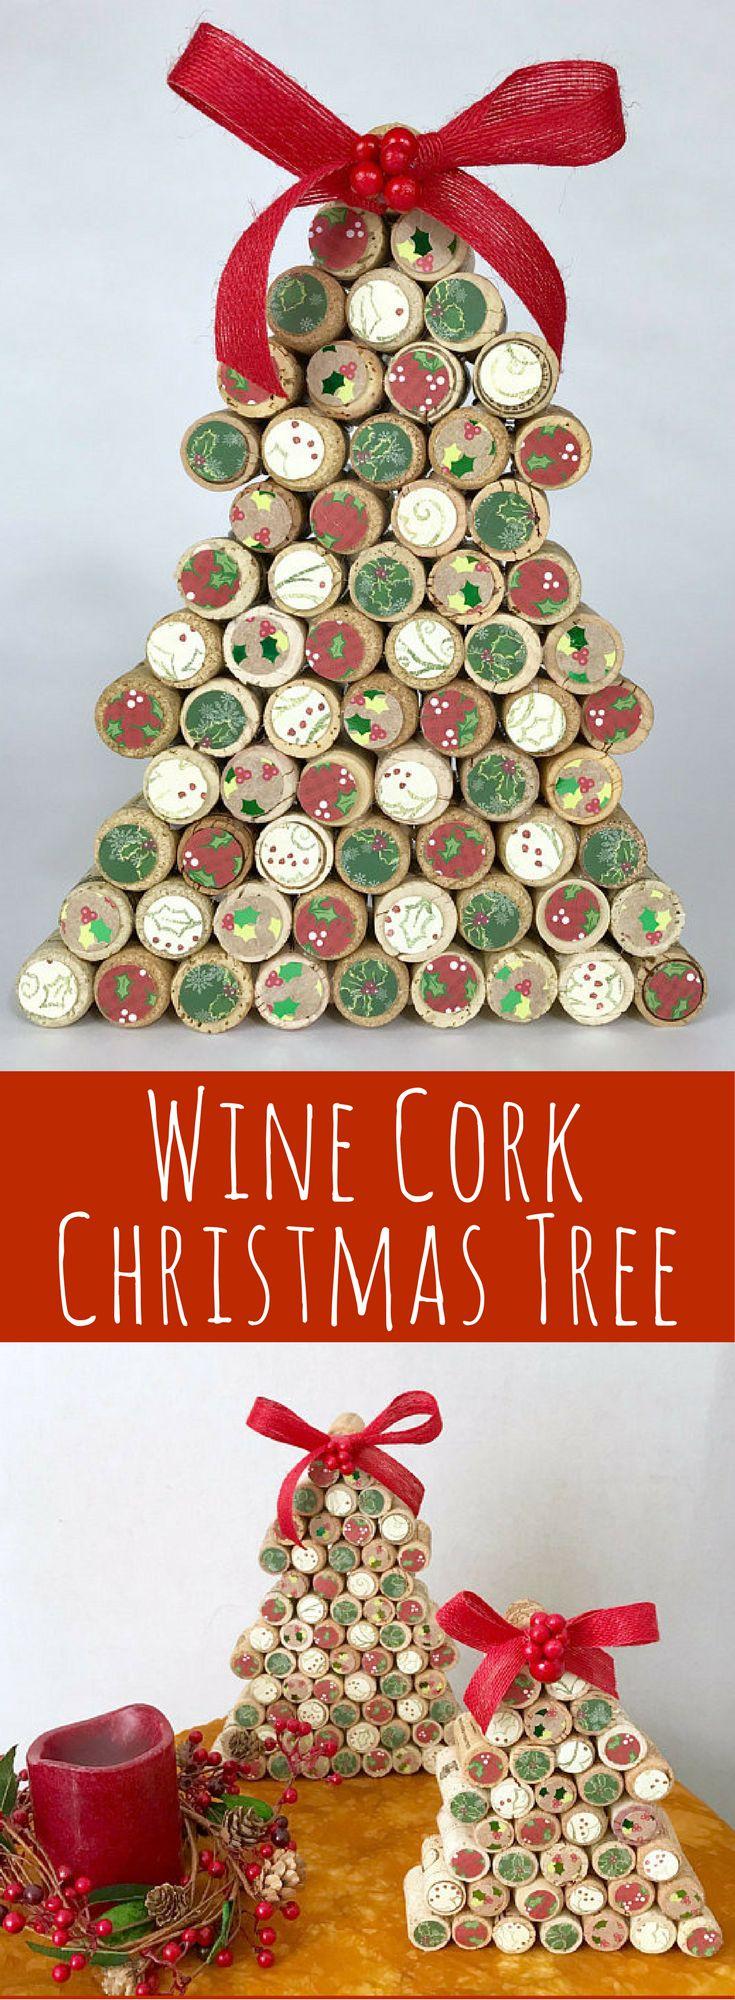 Wine Cork Christmas Tree Country Christmas Handmade Christmas Rustic Christmas Decor Wi Wine Cork Christmas Tree Rustic Christmas Tree Cool Christmas Trees